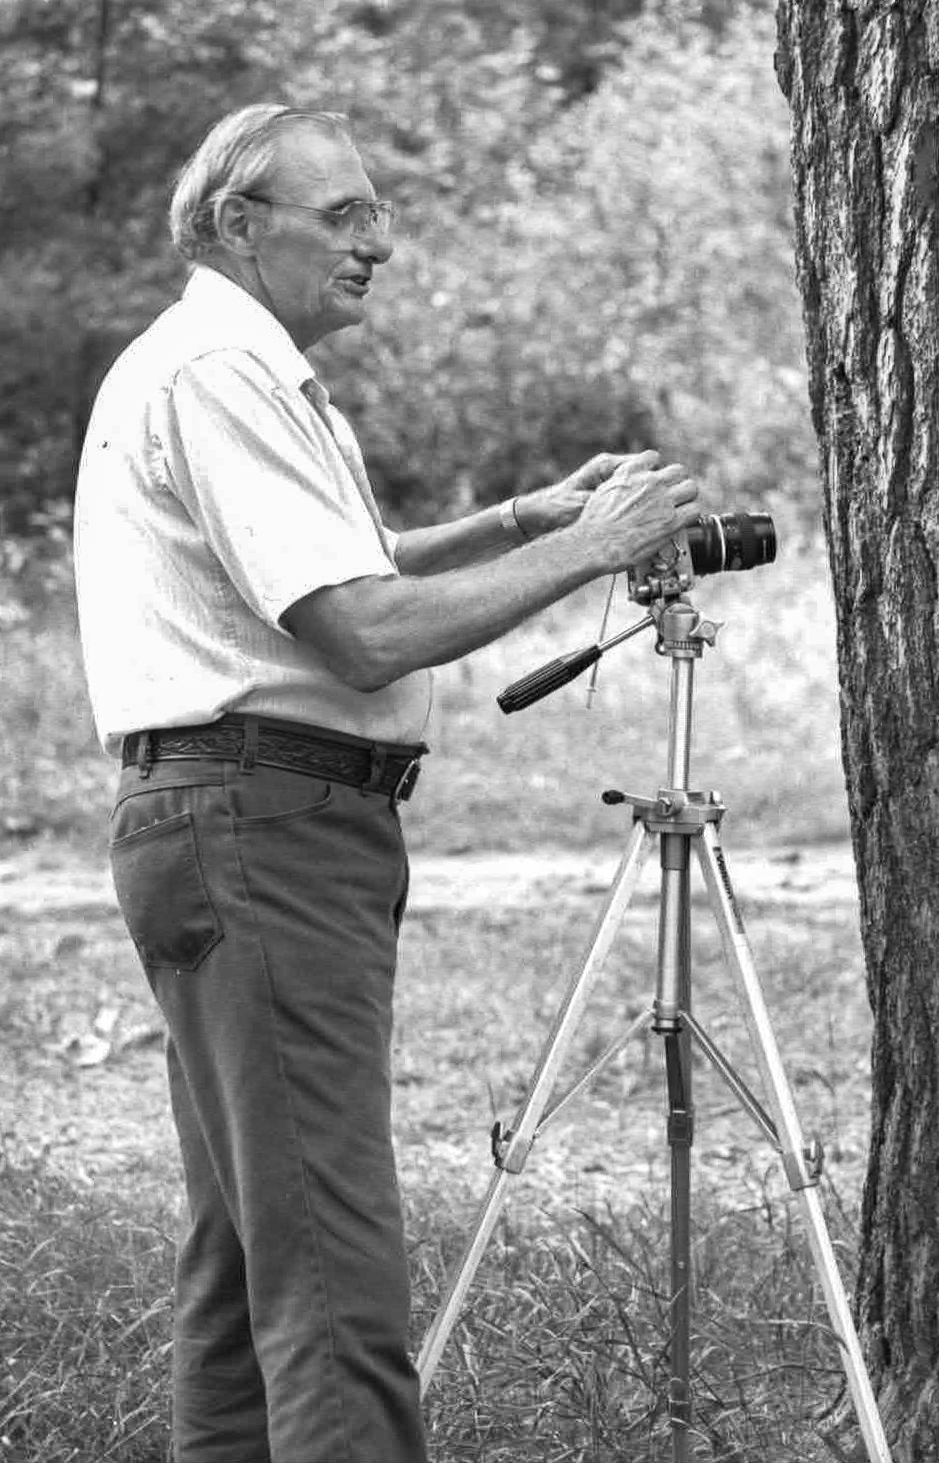 Dick Sheidler